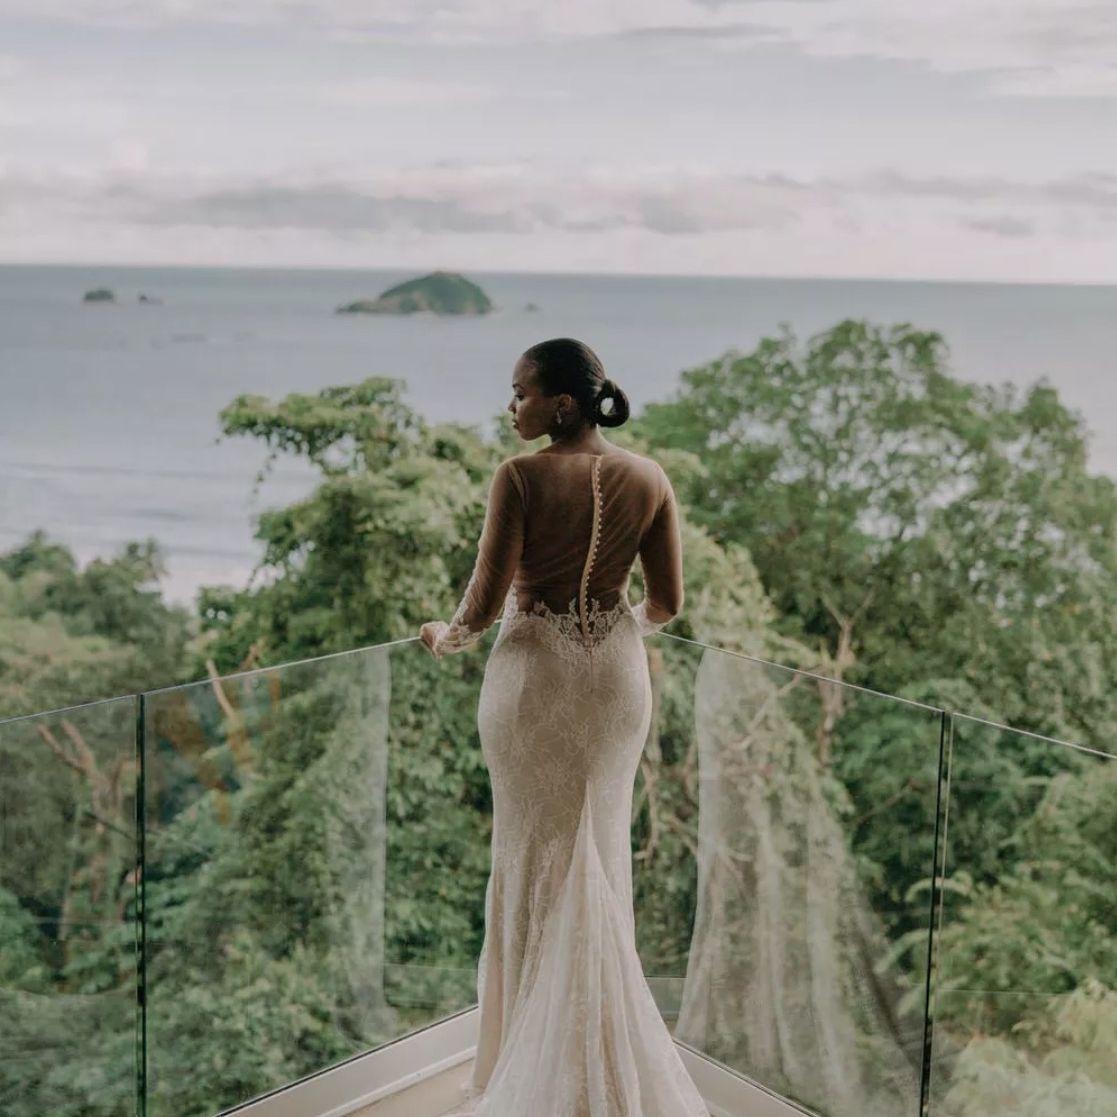 Bride looking out at ocean